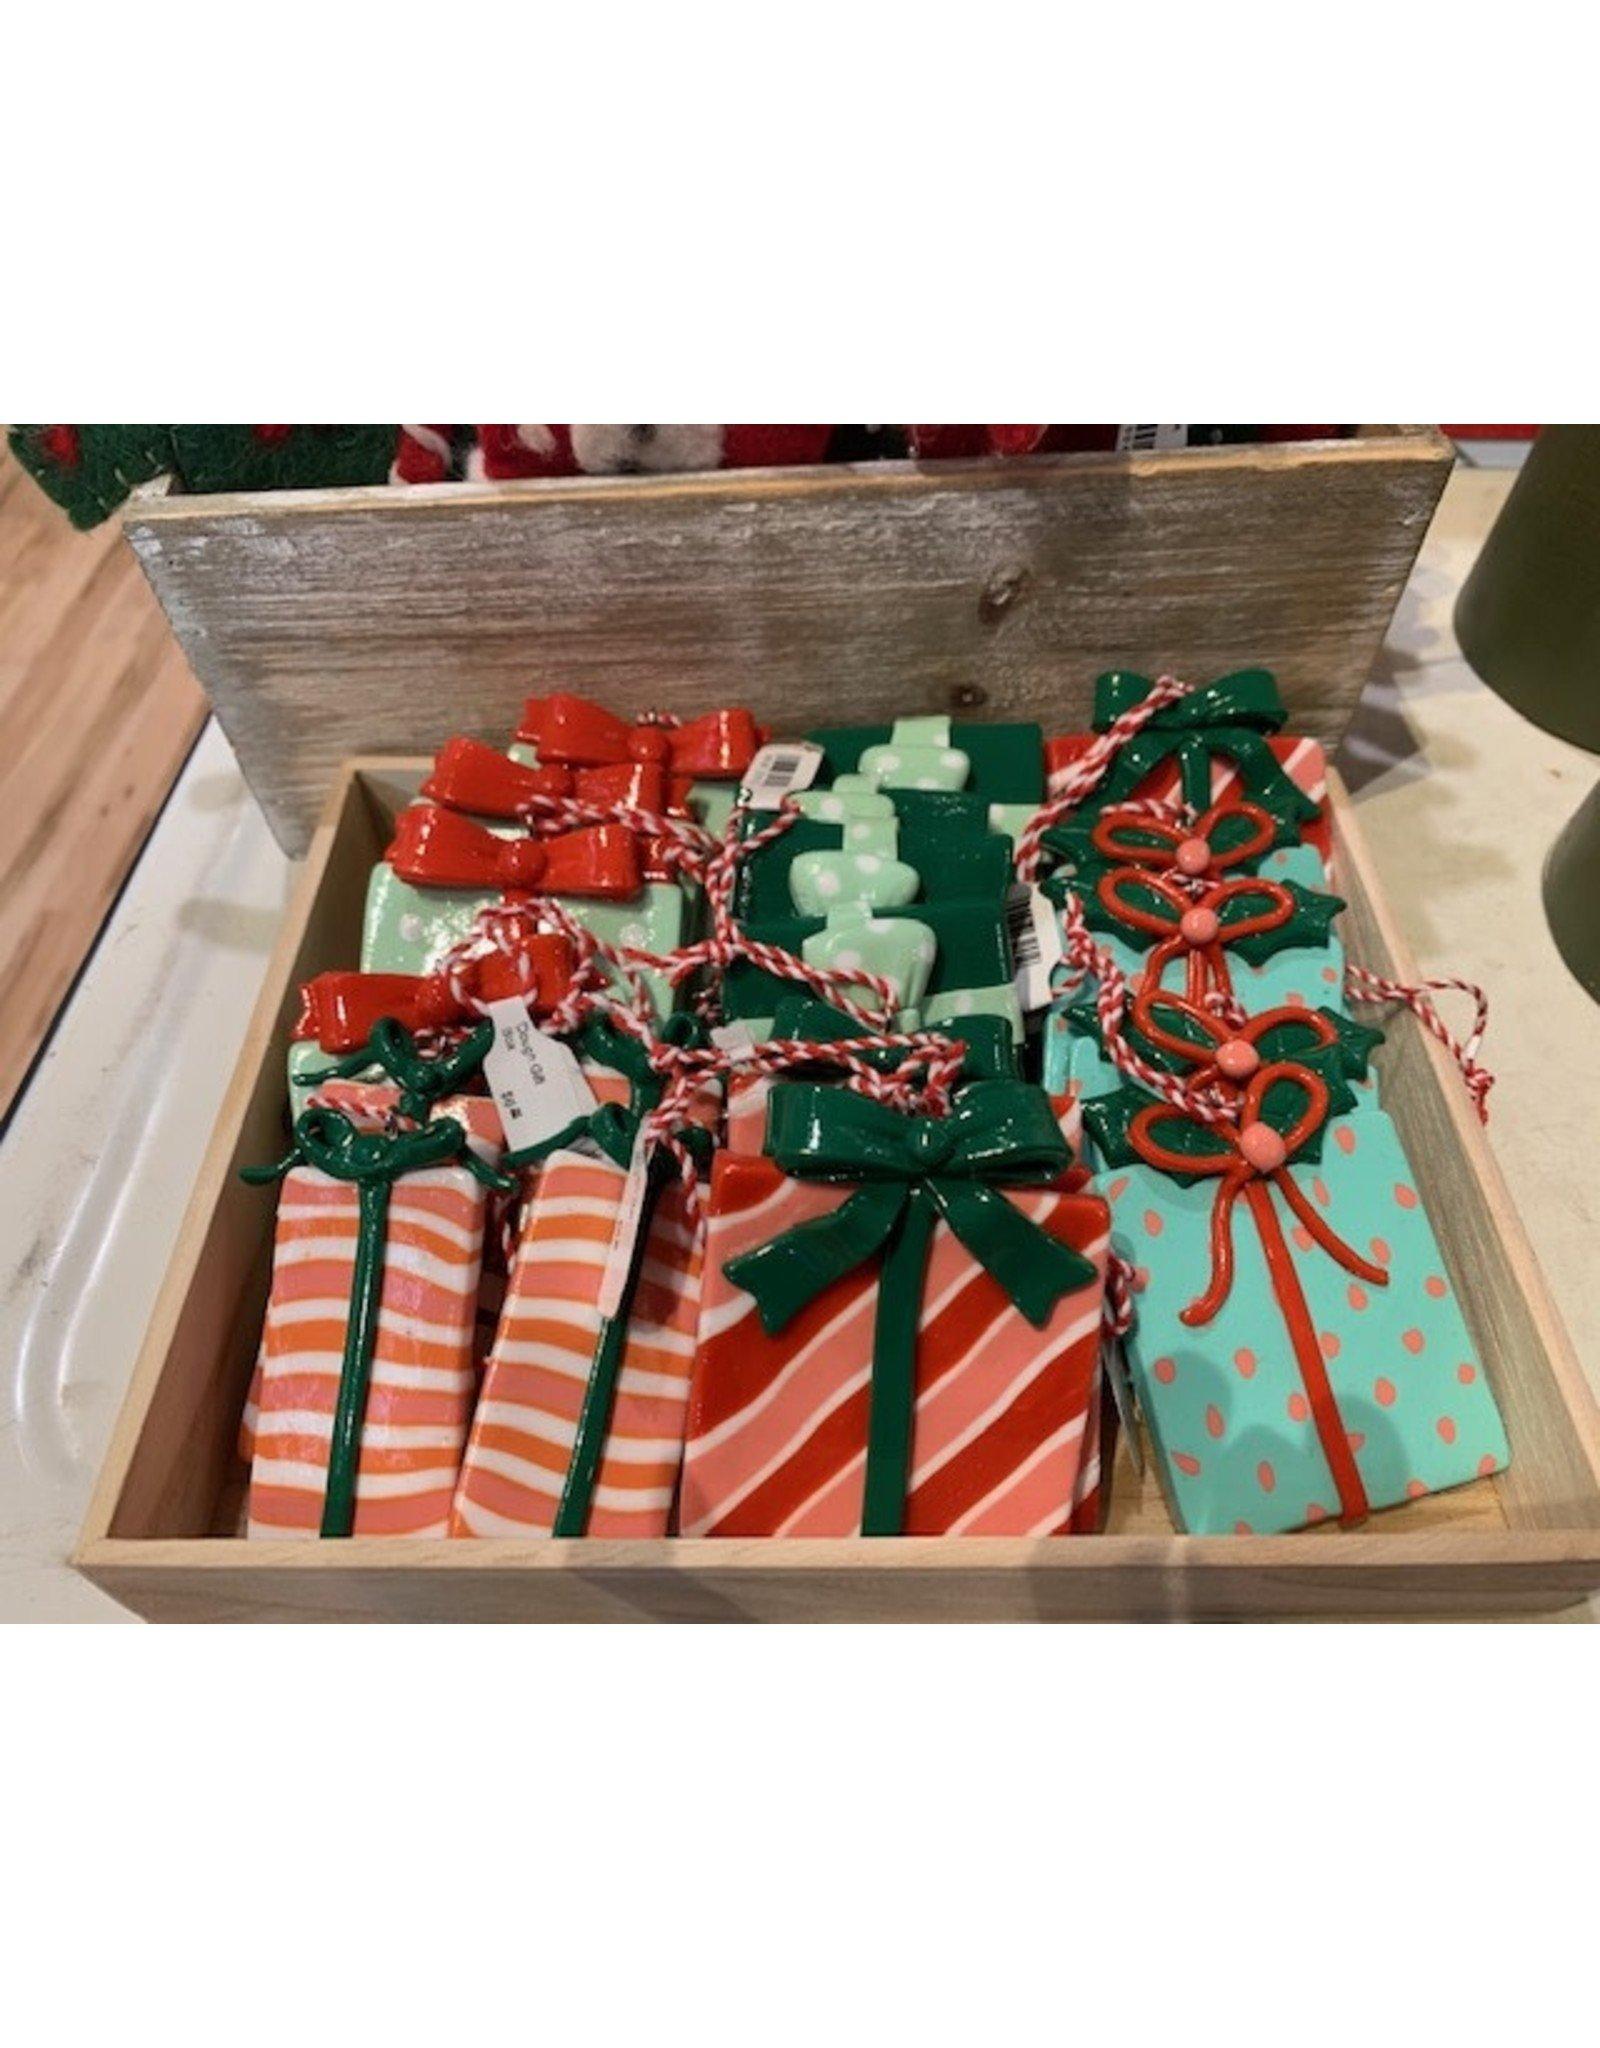 Dough Gift Box Ornament, 5 styles